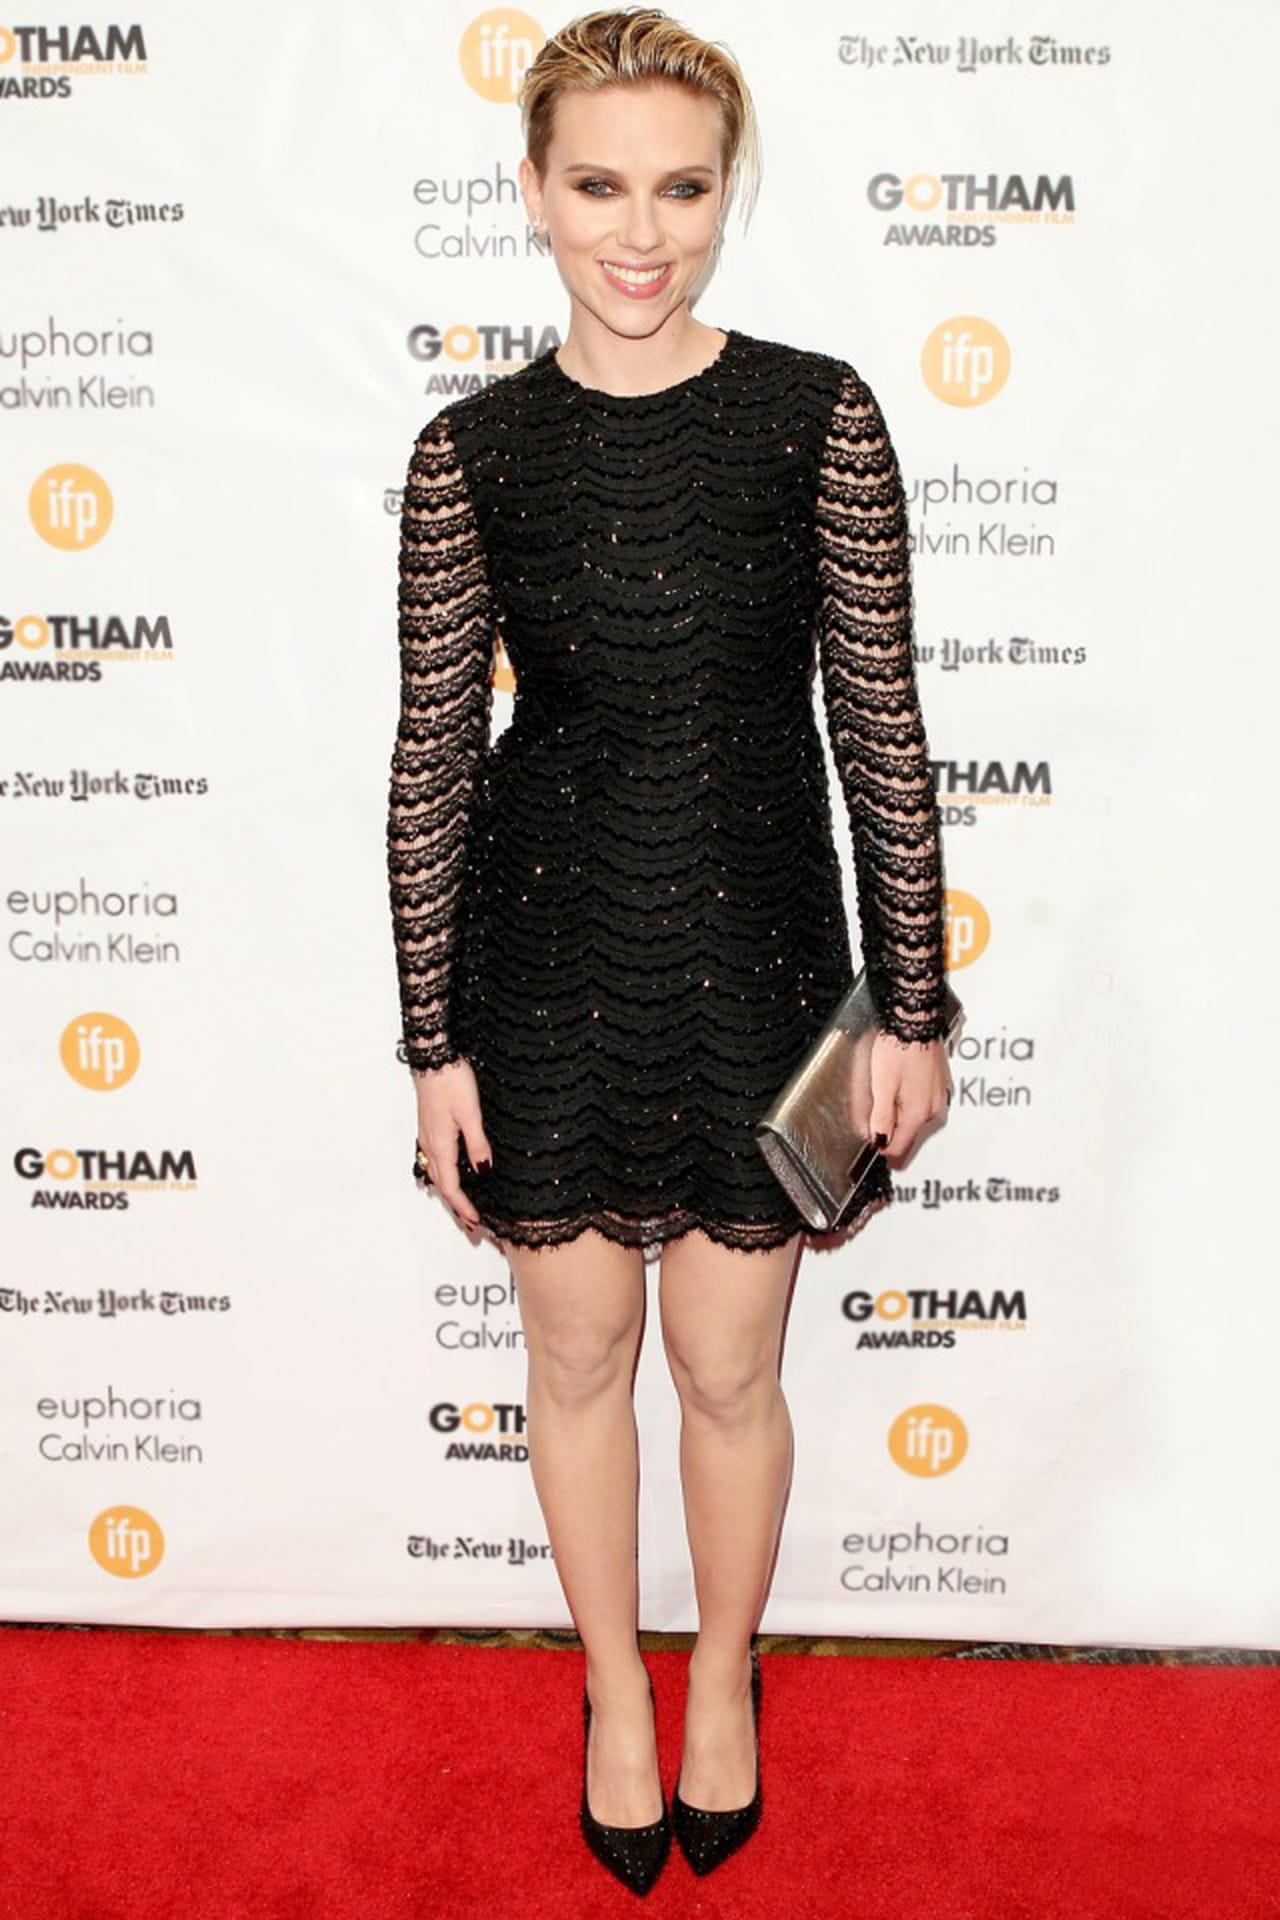 Scarlett Awards Johansson Saint Independent Laurent Ai Gotham Film In WeHIY9ED2